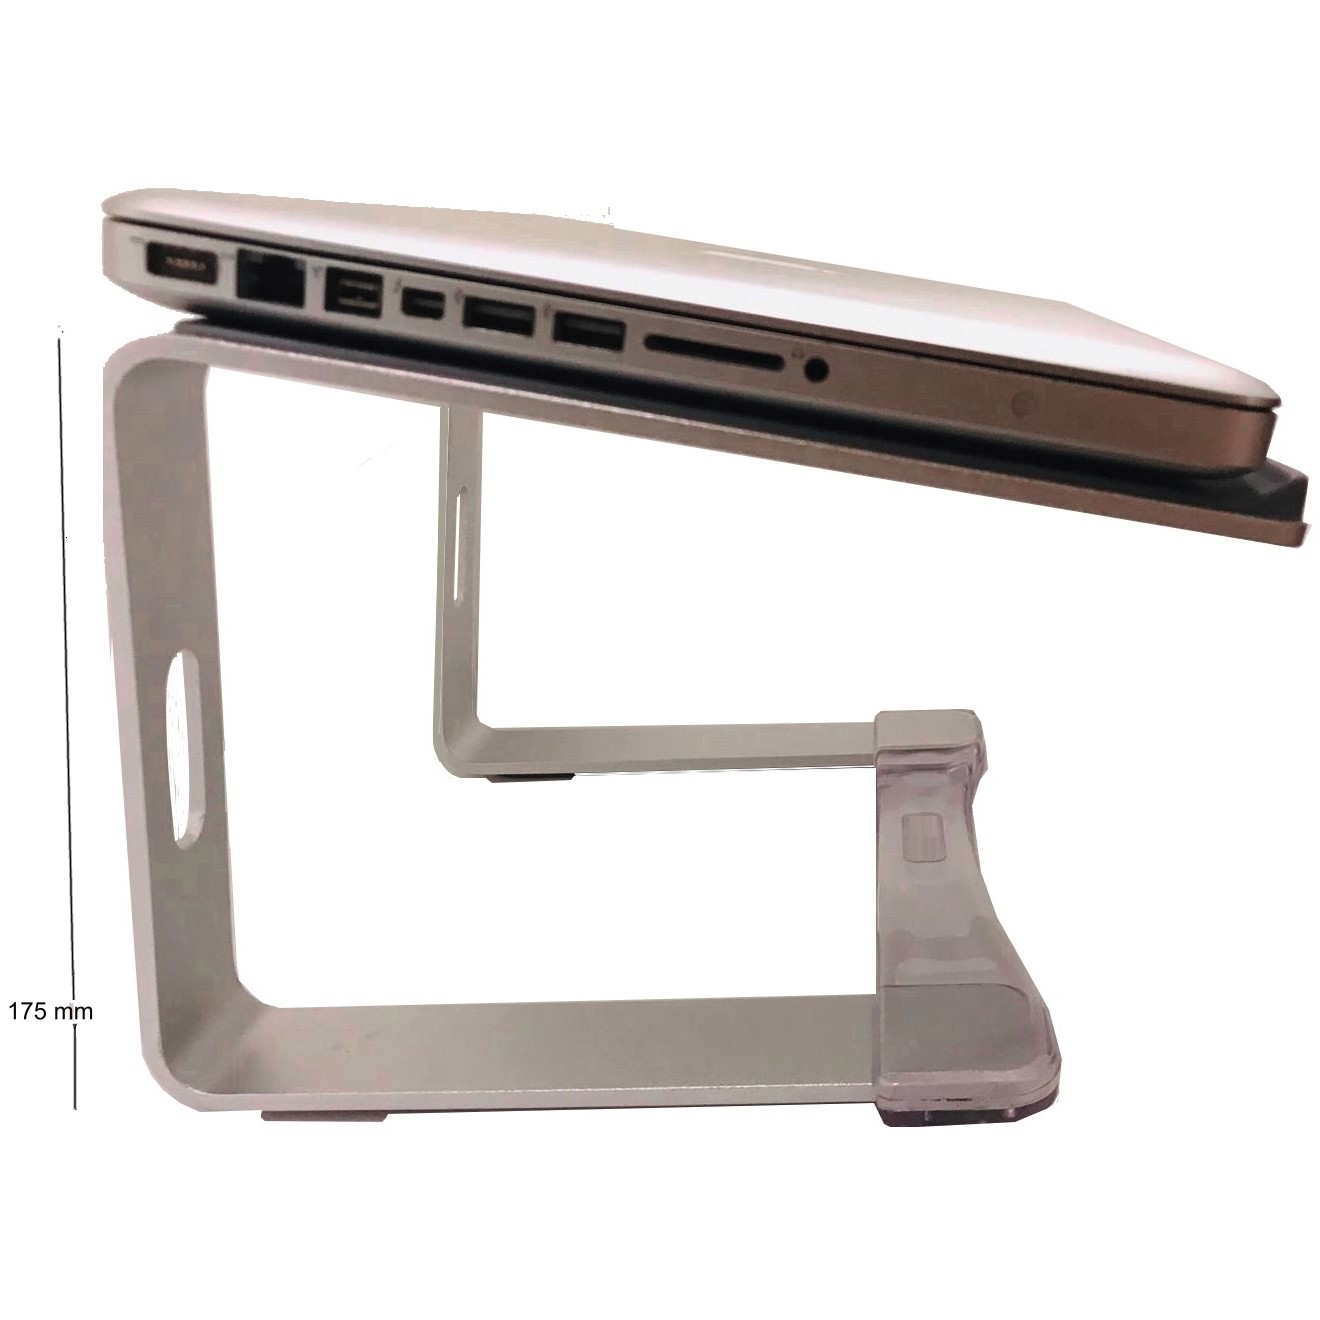 Suporte Elevado Aluminio Curv Higher + Alto 175mm s17